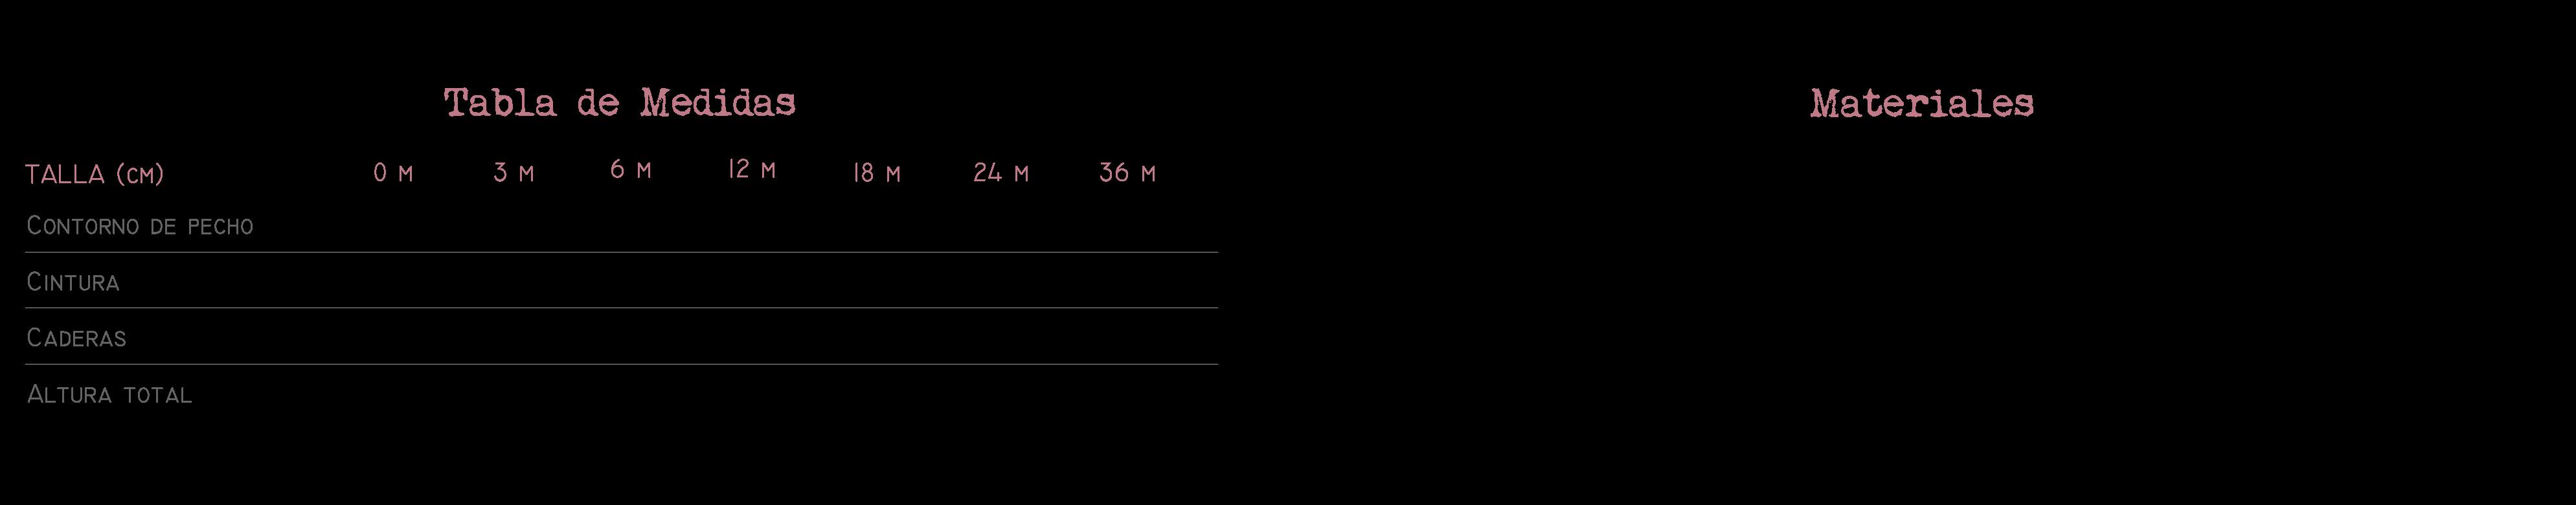 pdf4_materialesmedidas